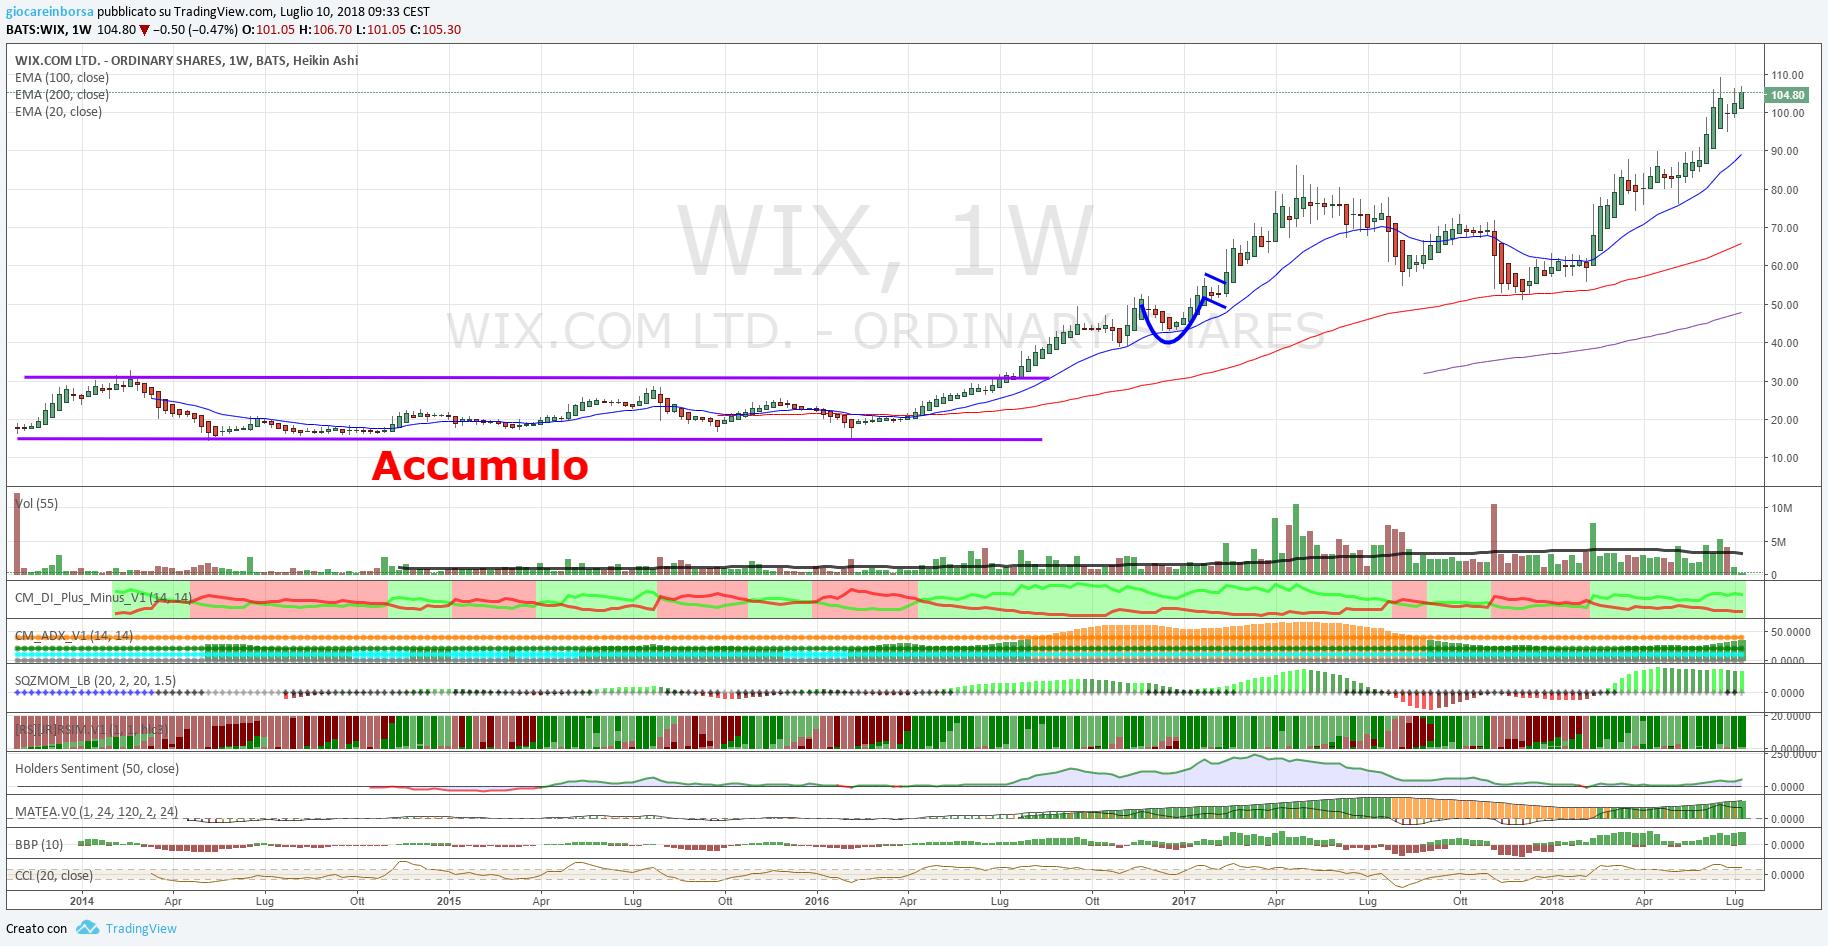 Azioni Wix.com, vicina ai massimi storici!